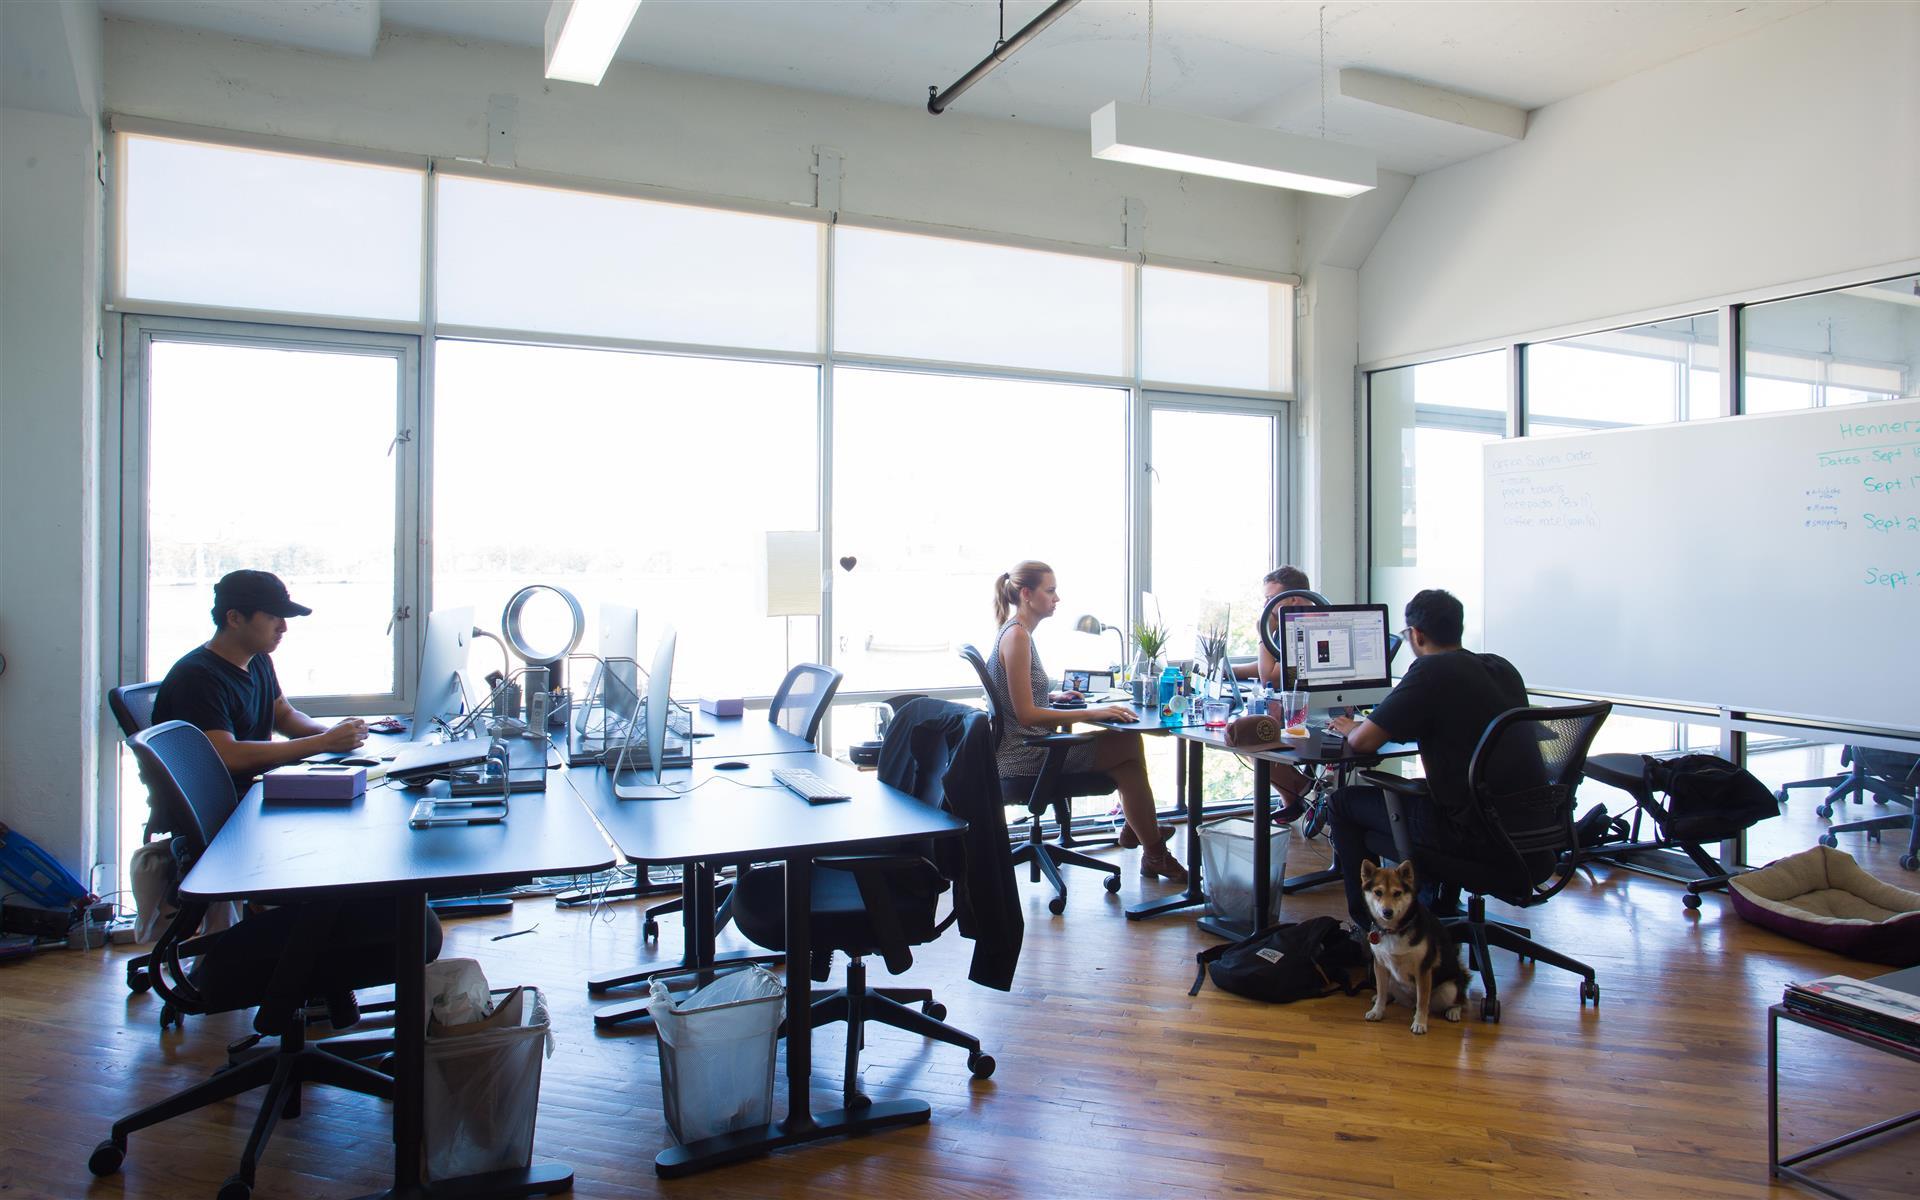 Green Desk - 240 Kent Ave - 11 Desk Office with Natural Lighting